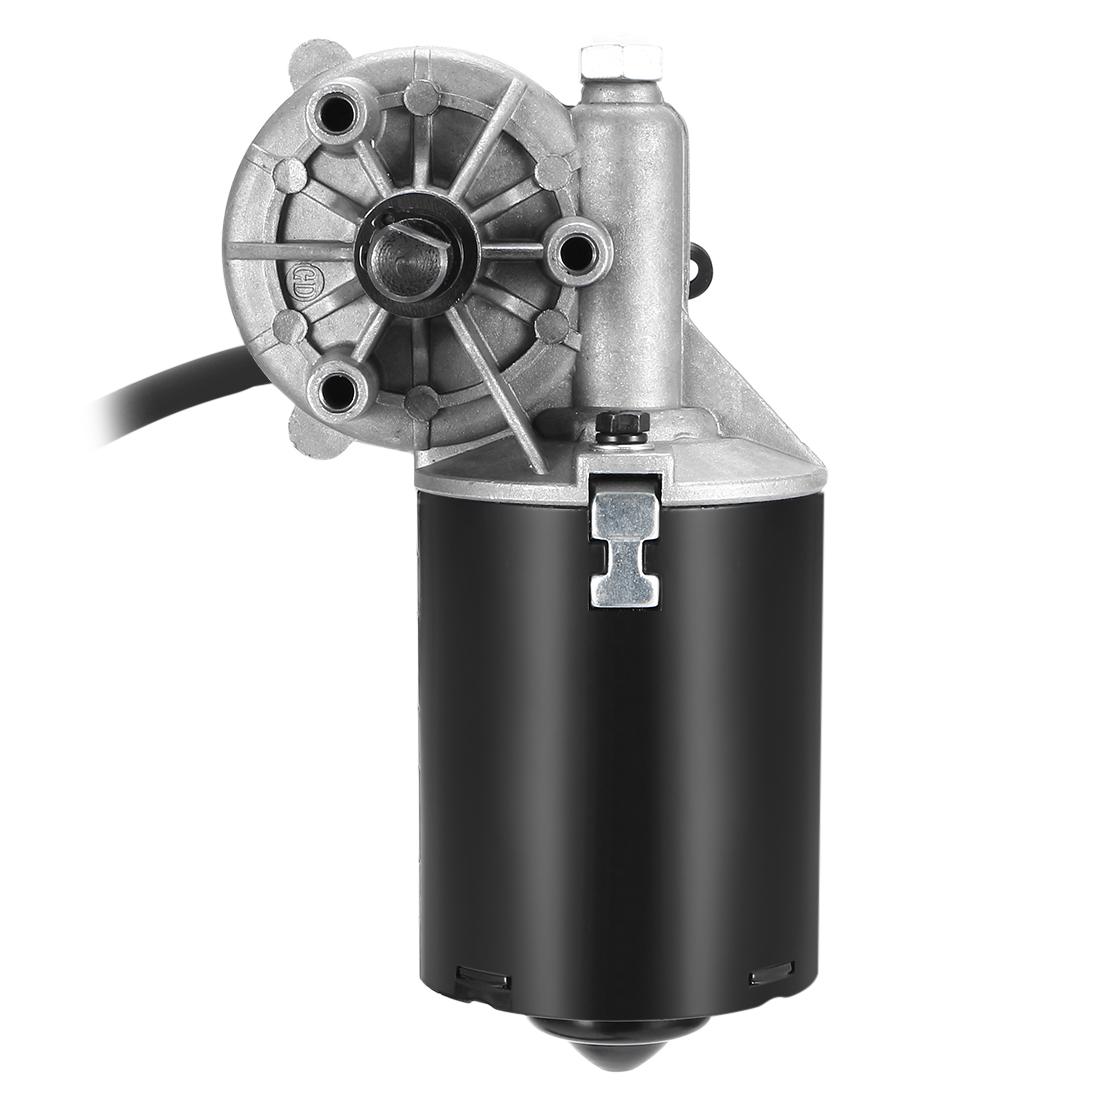 12mm Left D Shaft 12V DC Reversible Electric Gear Motor 42 RPM